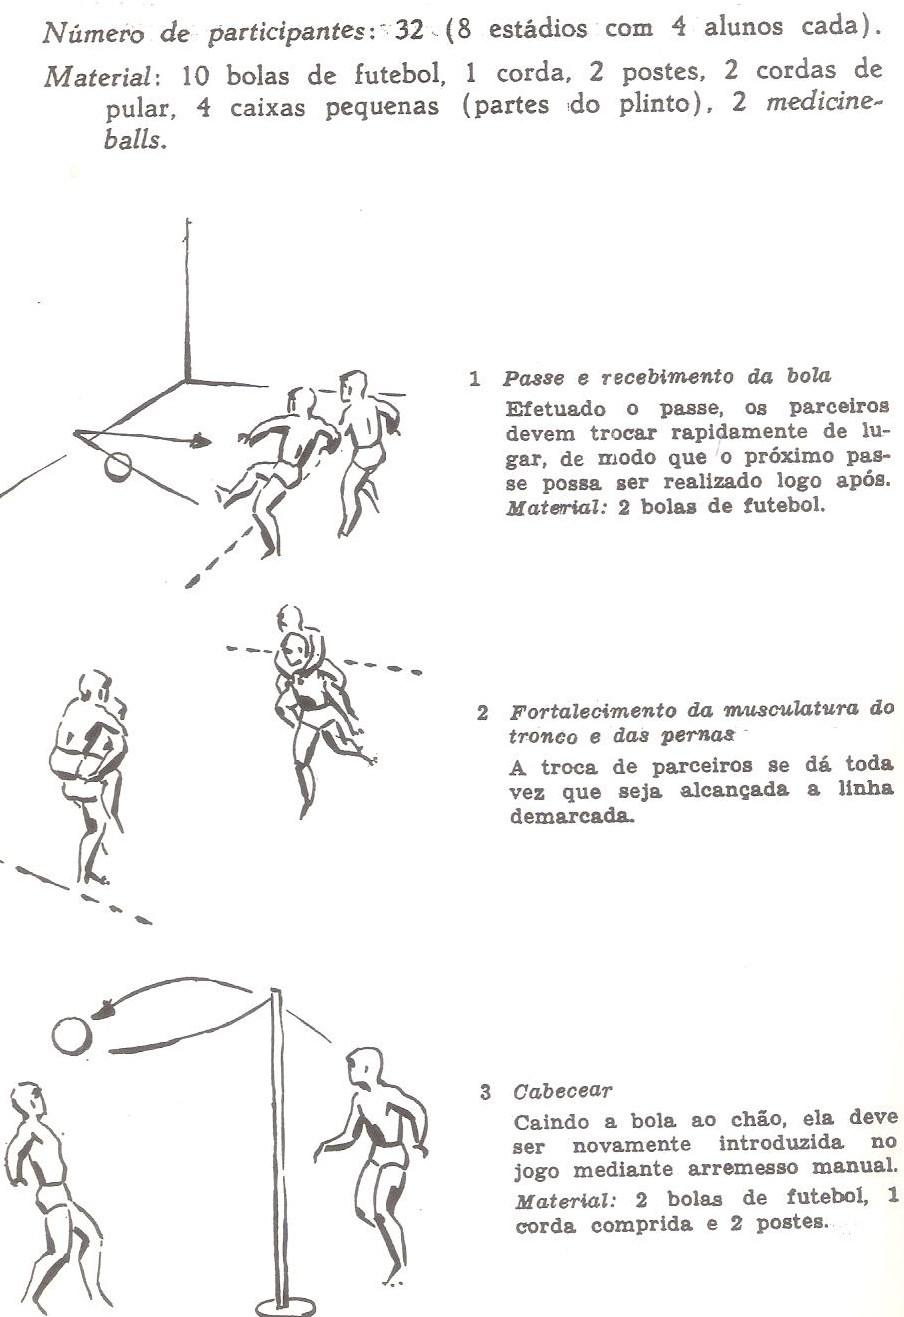 01c9a0c86aadd EducAção Física  CIRCUITO PARA FUTSAL